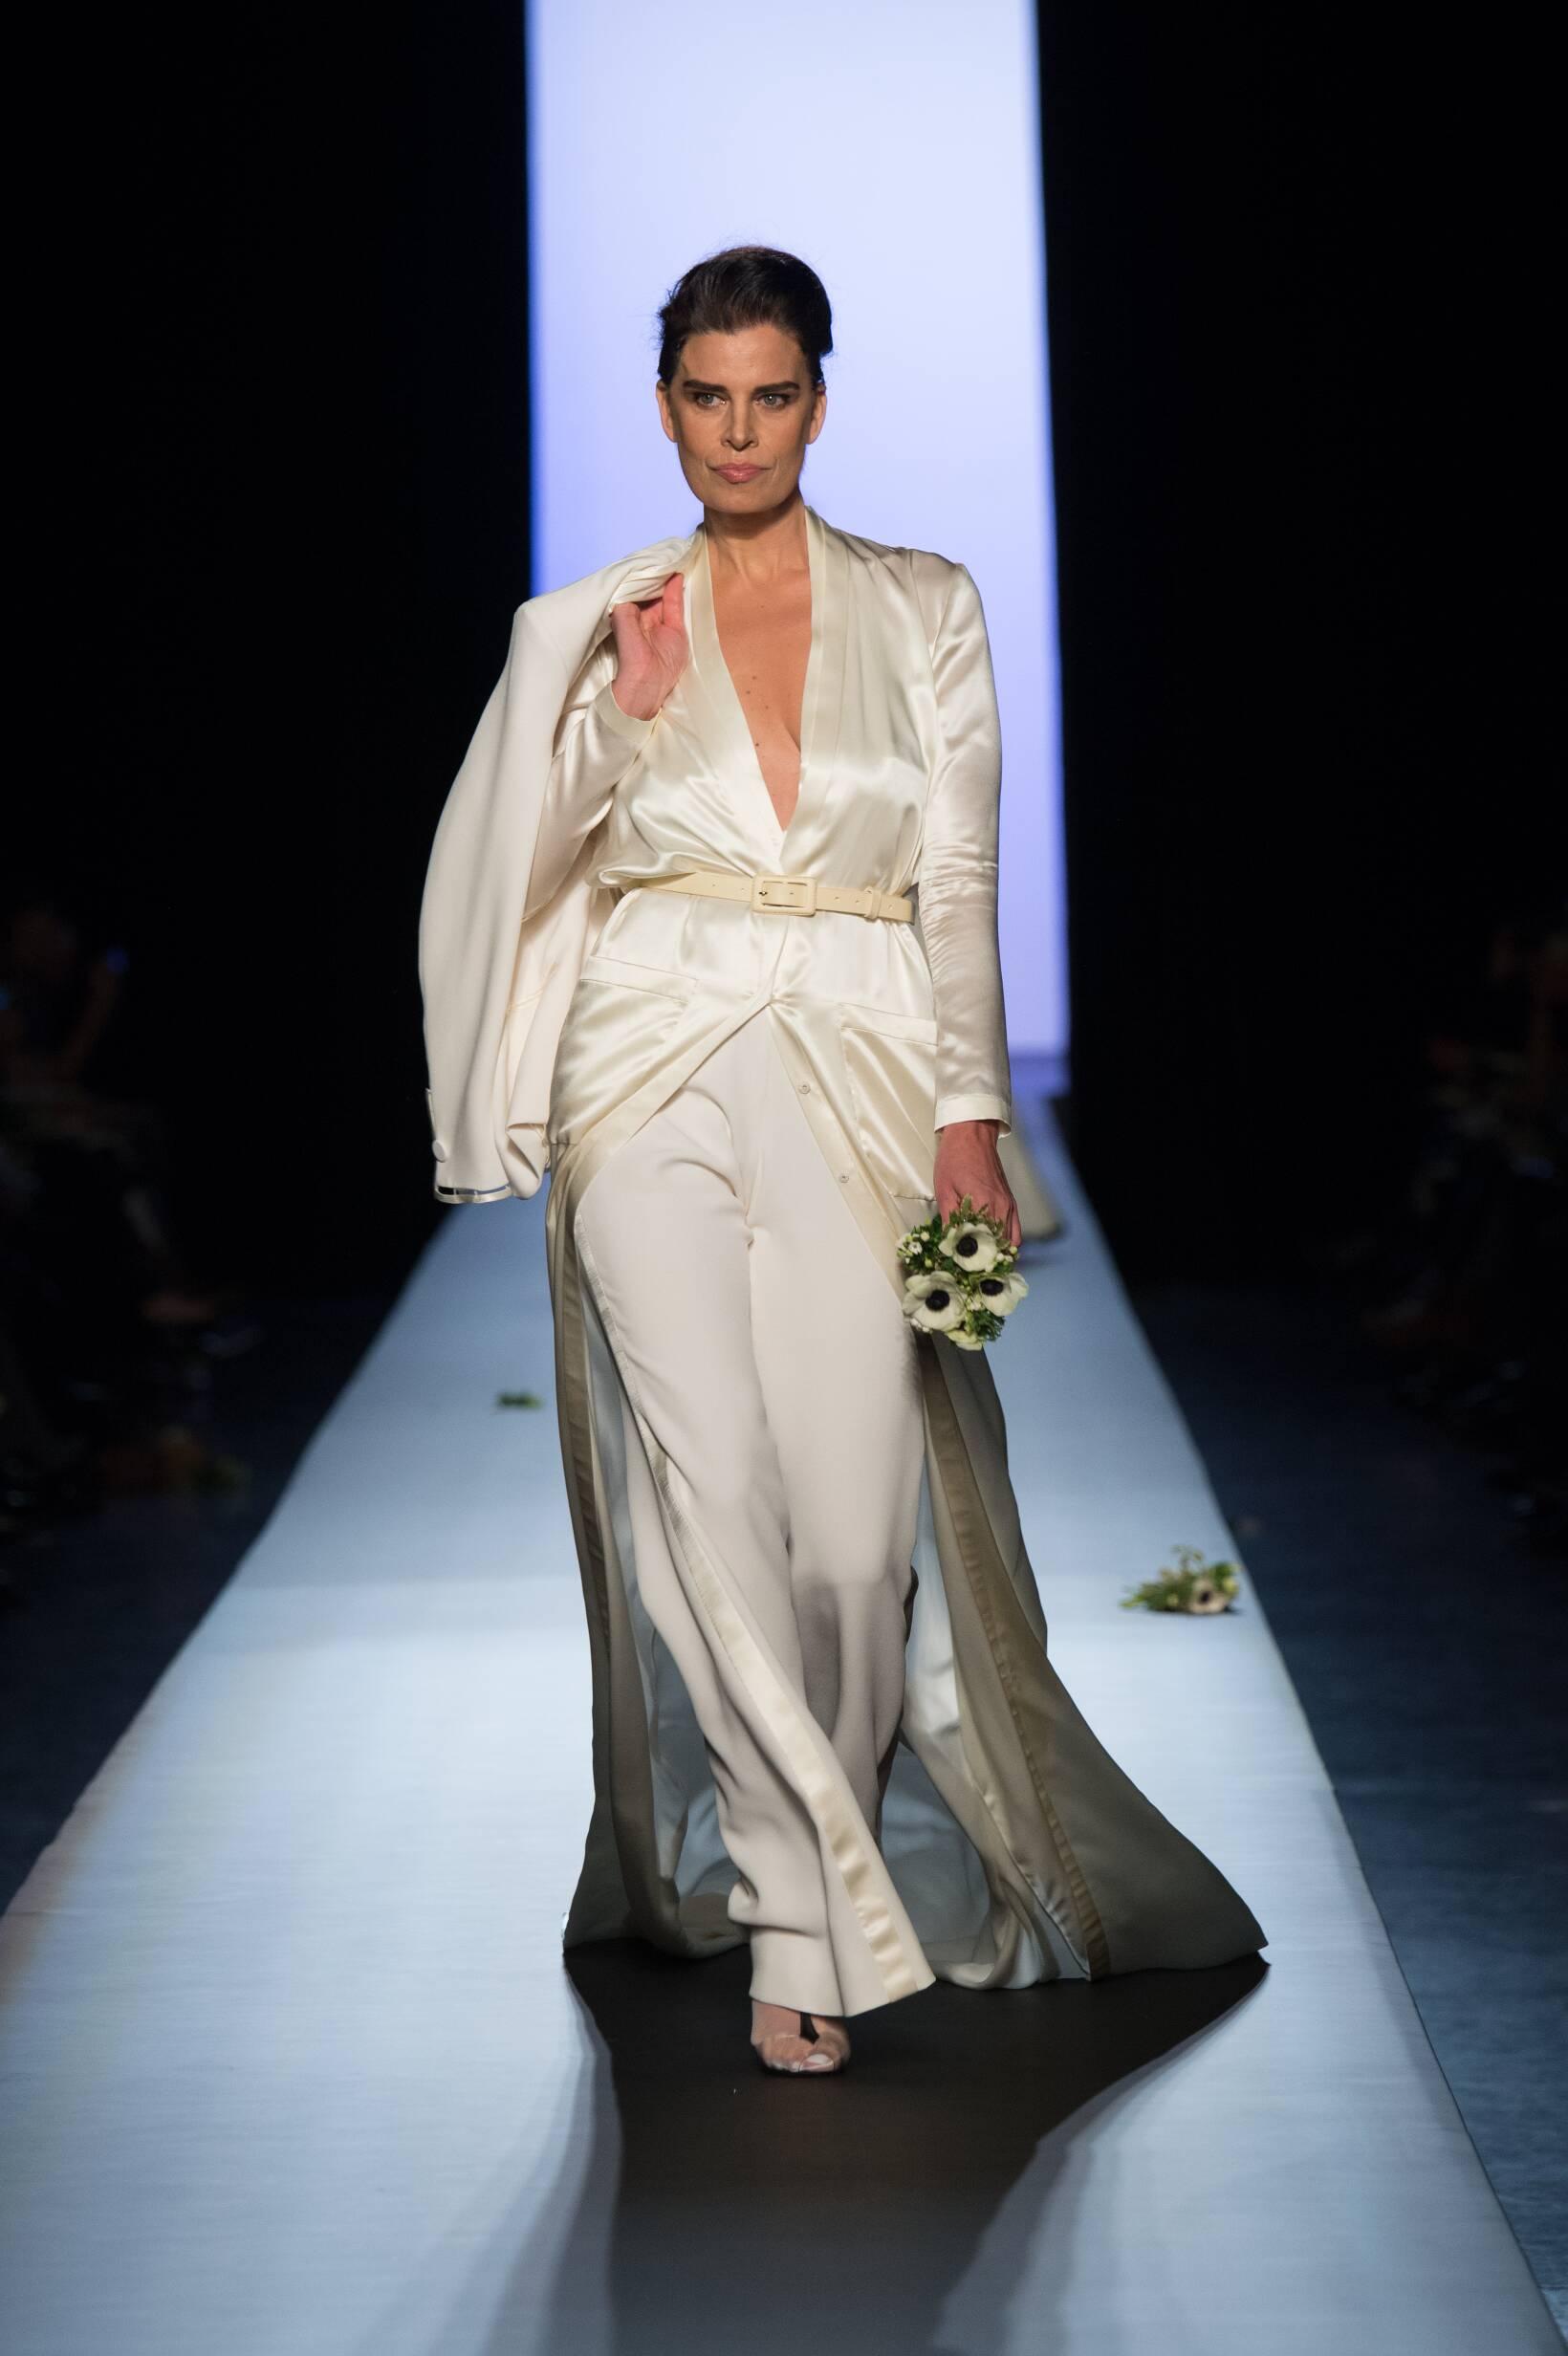 Catwalk Jean Paul Gaultier Haute Couture Spring Summer 2015 Women's Collection Paris Fashion Week